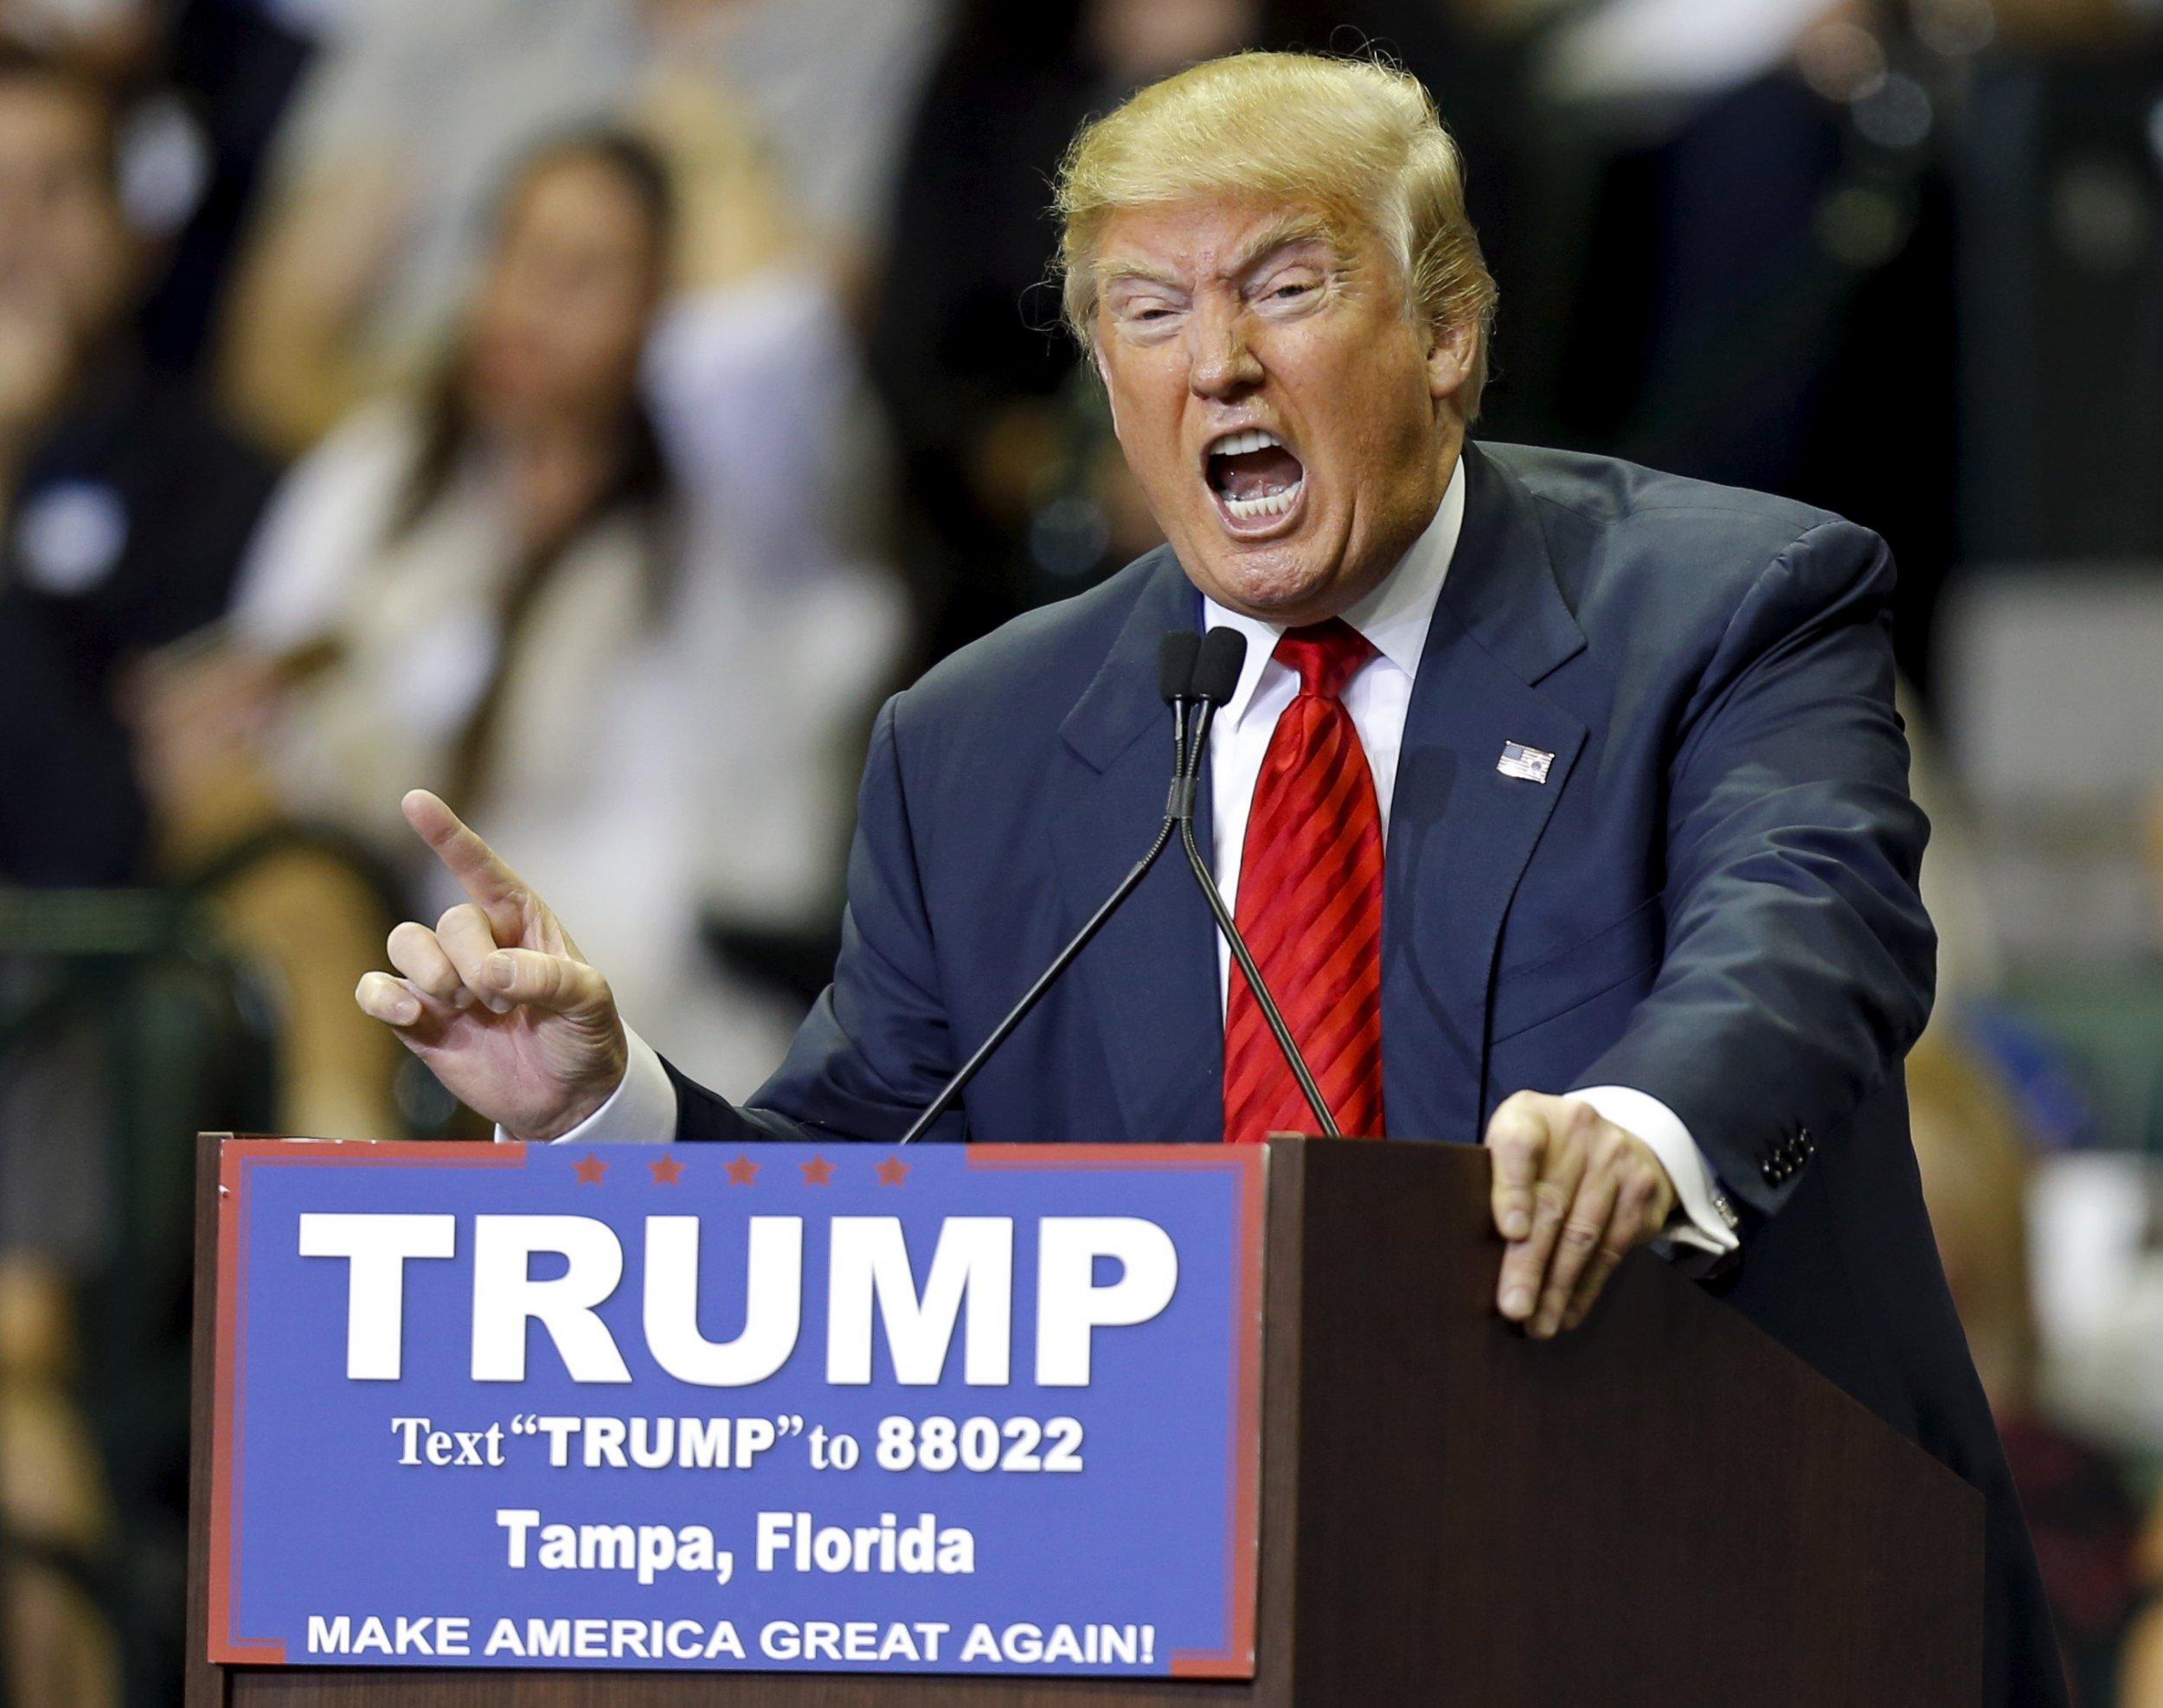 Donald Trump speaks at Florida rally